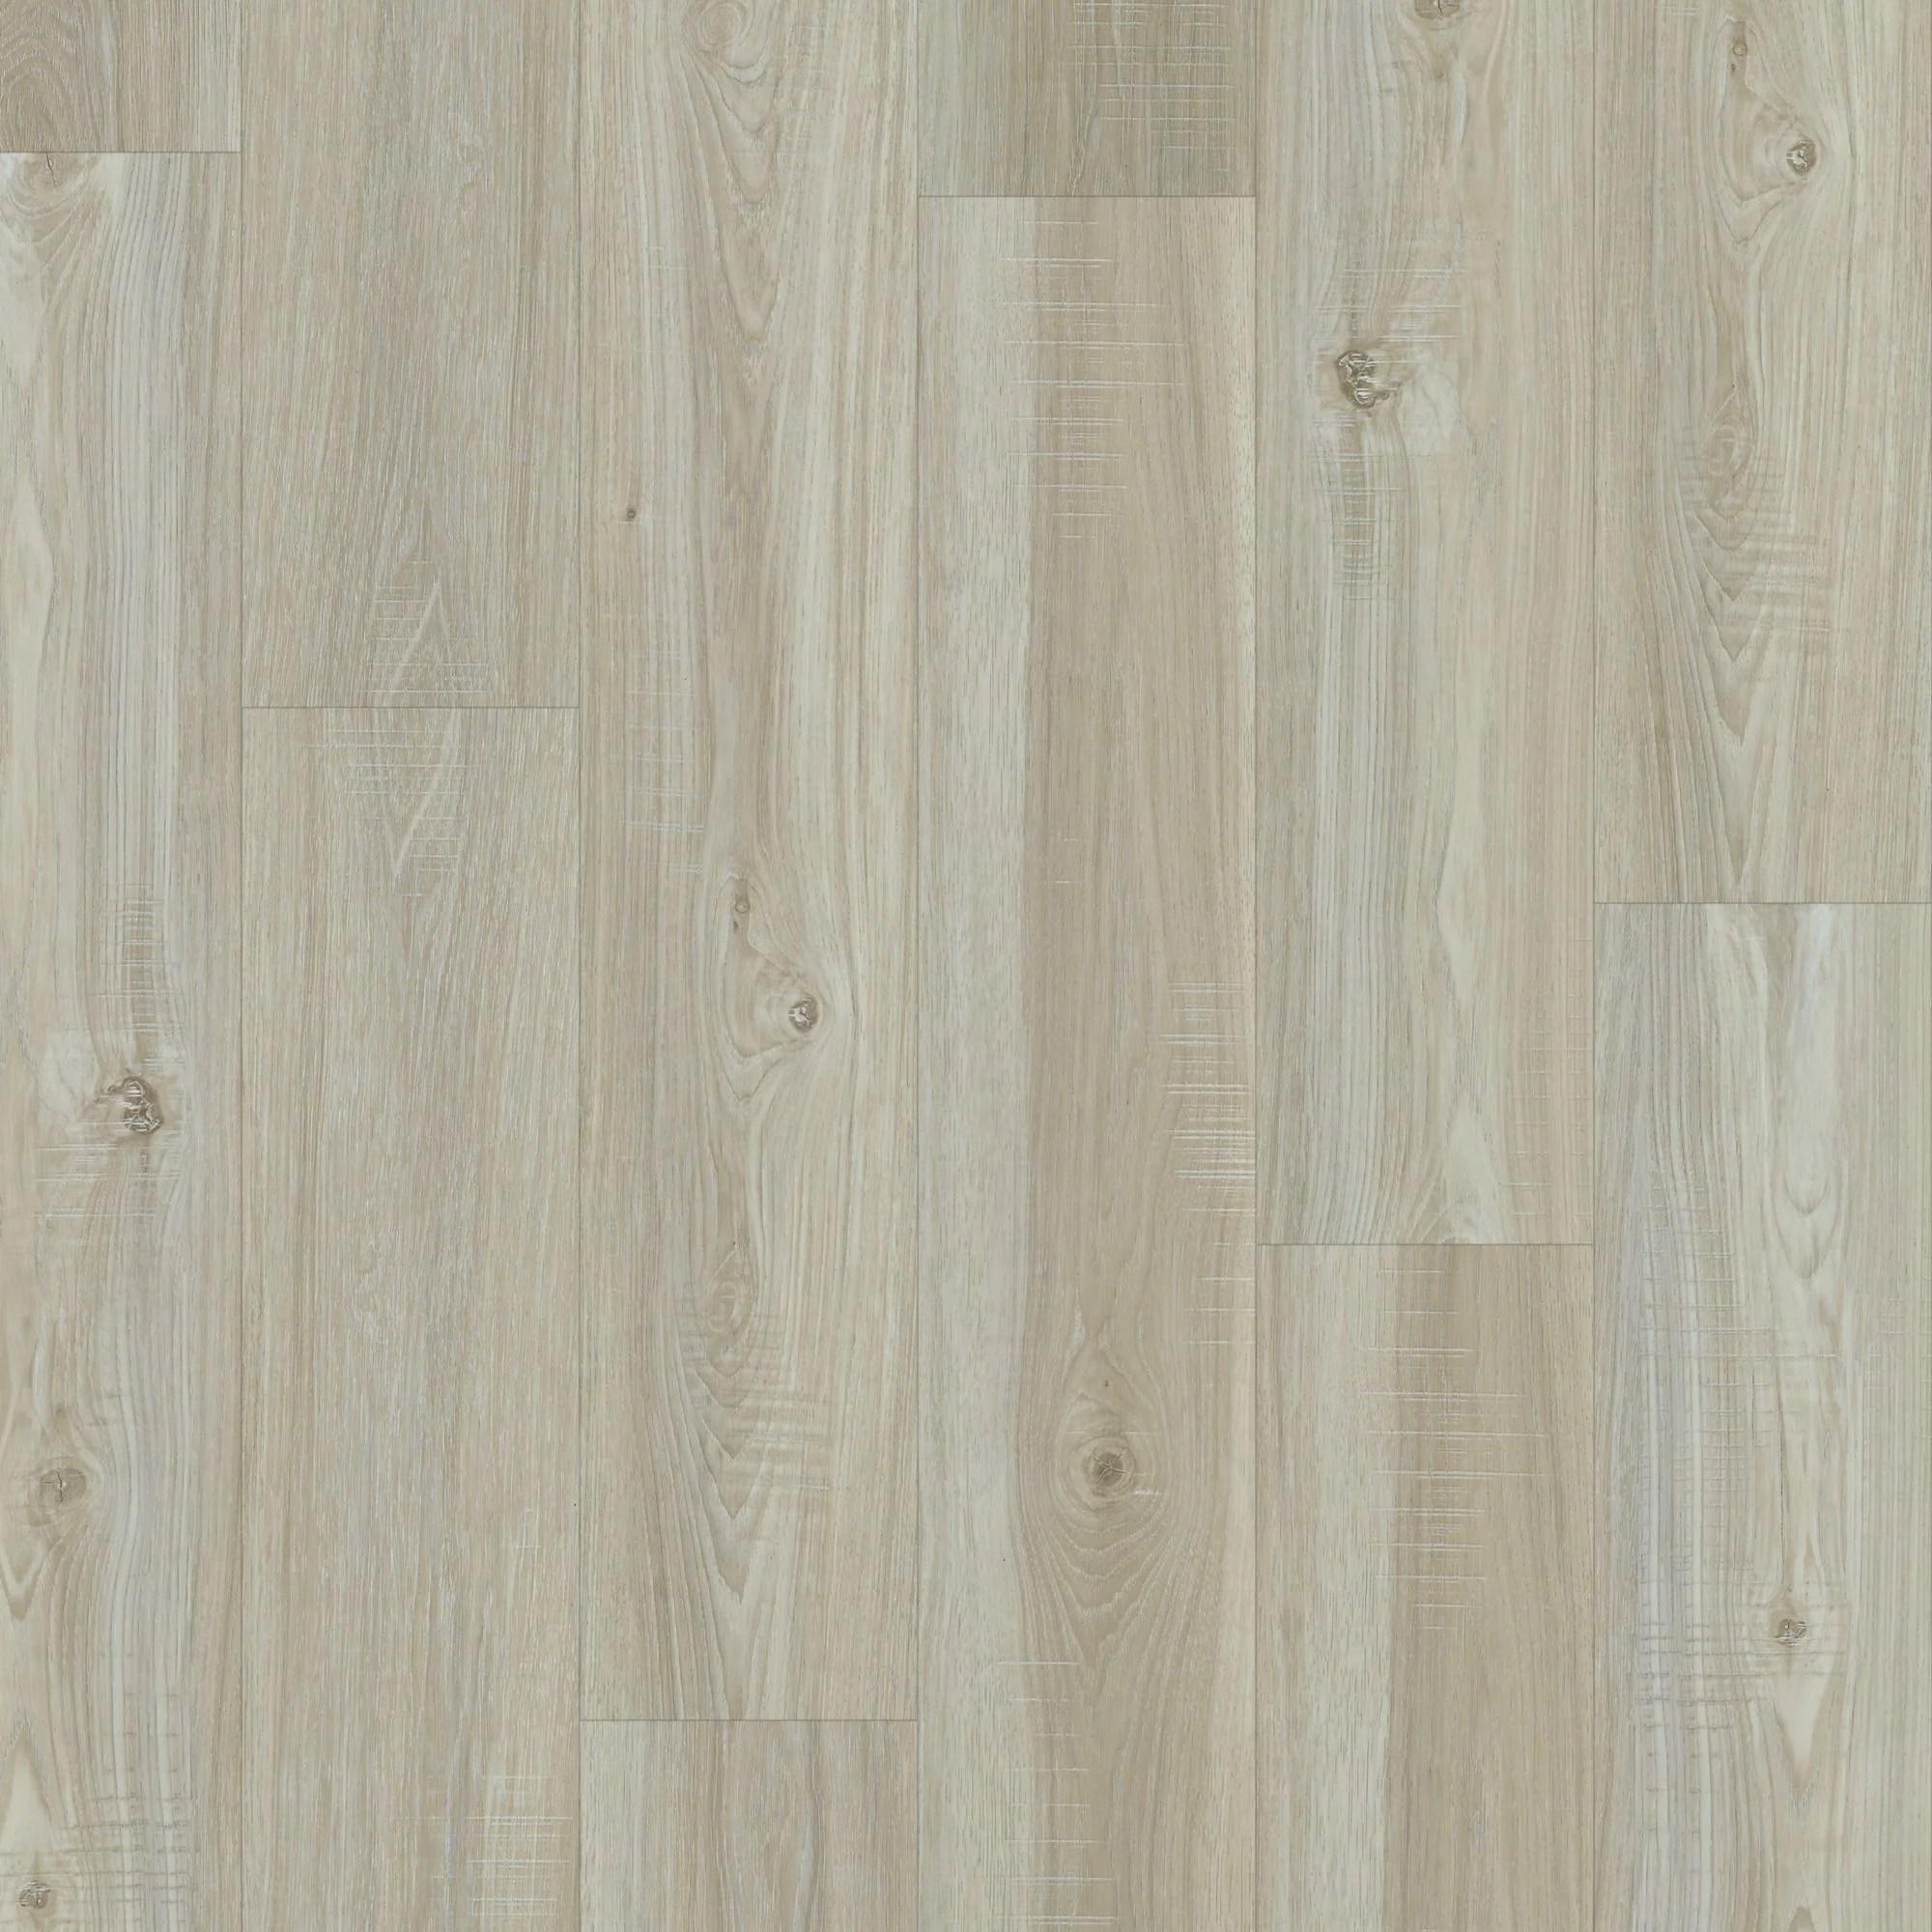 shaw prime plank washed oak 0616v 00509 lvp lvt gluedown luxury vinyl plank tile flooring 51 33 sq ft box